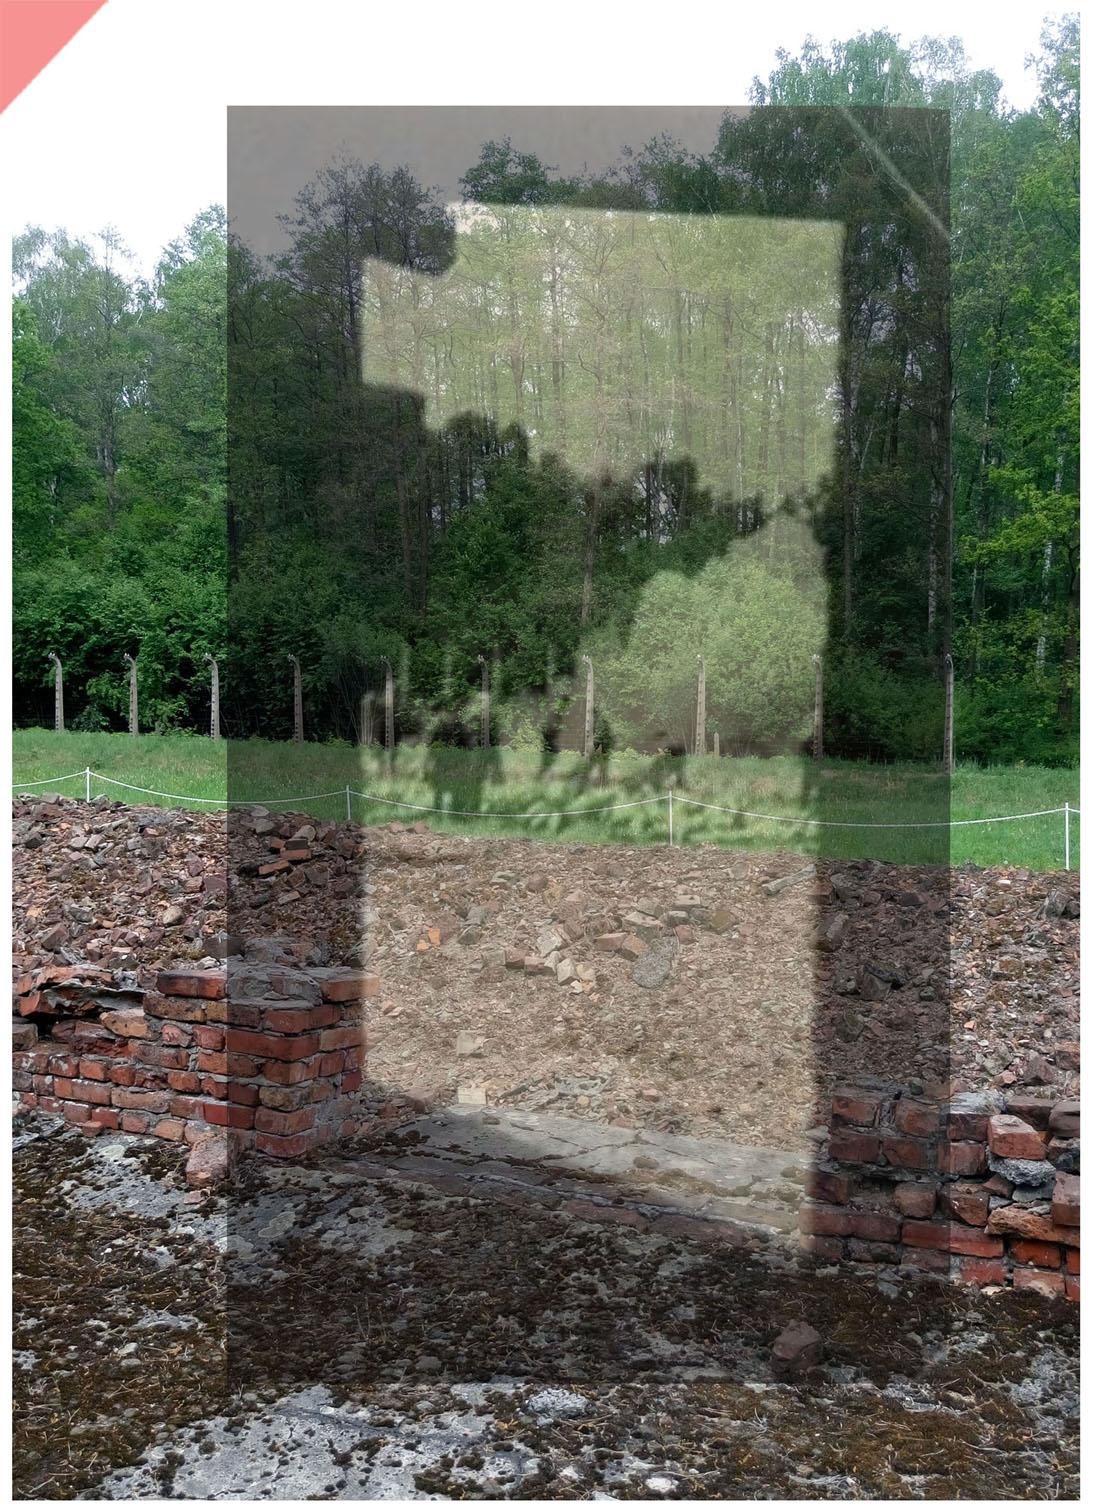 Auschwitz-Birkenau-Krematorium-5-V-superimpose-Sonderkommando-Hungaria-now-then-1943-1944-Photo